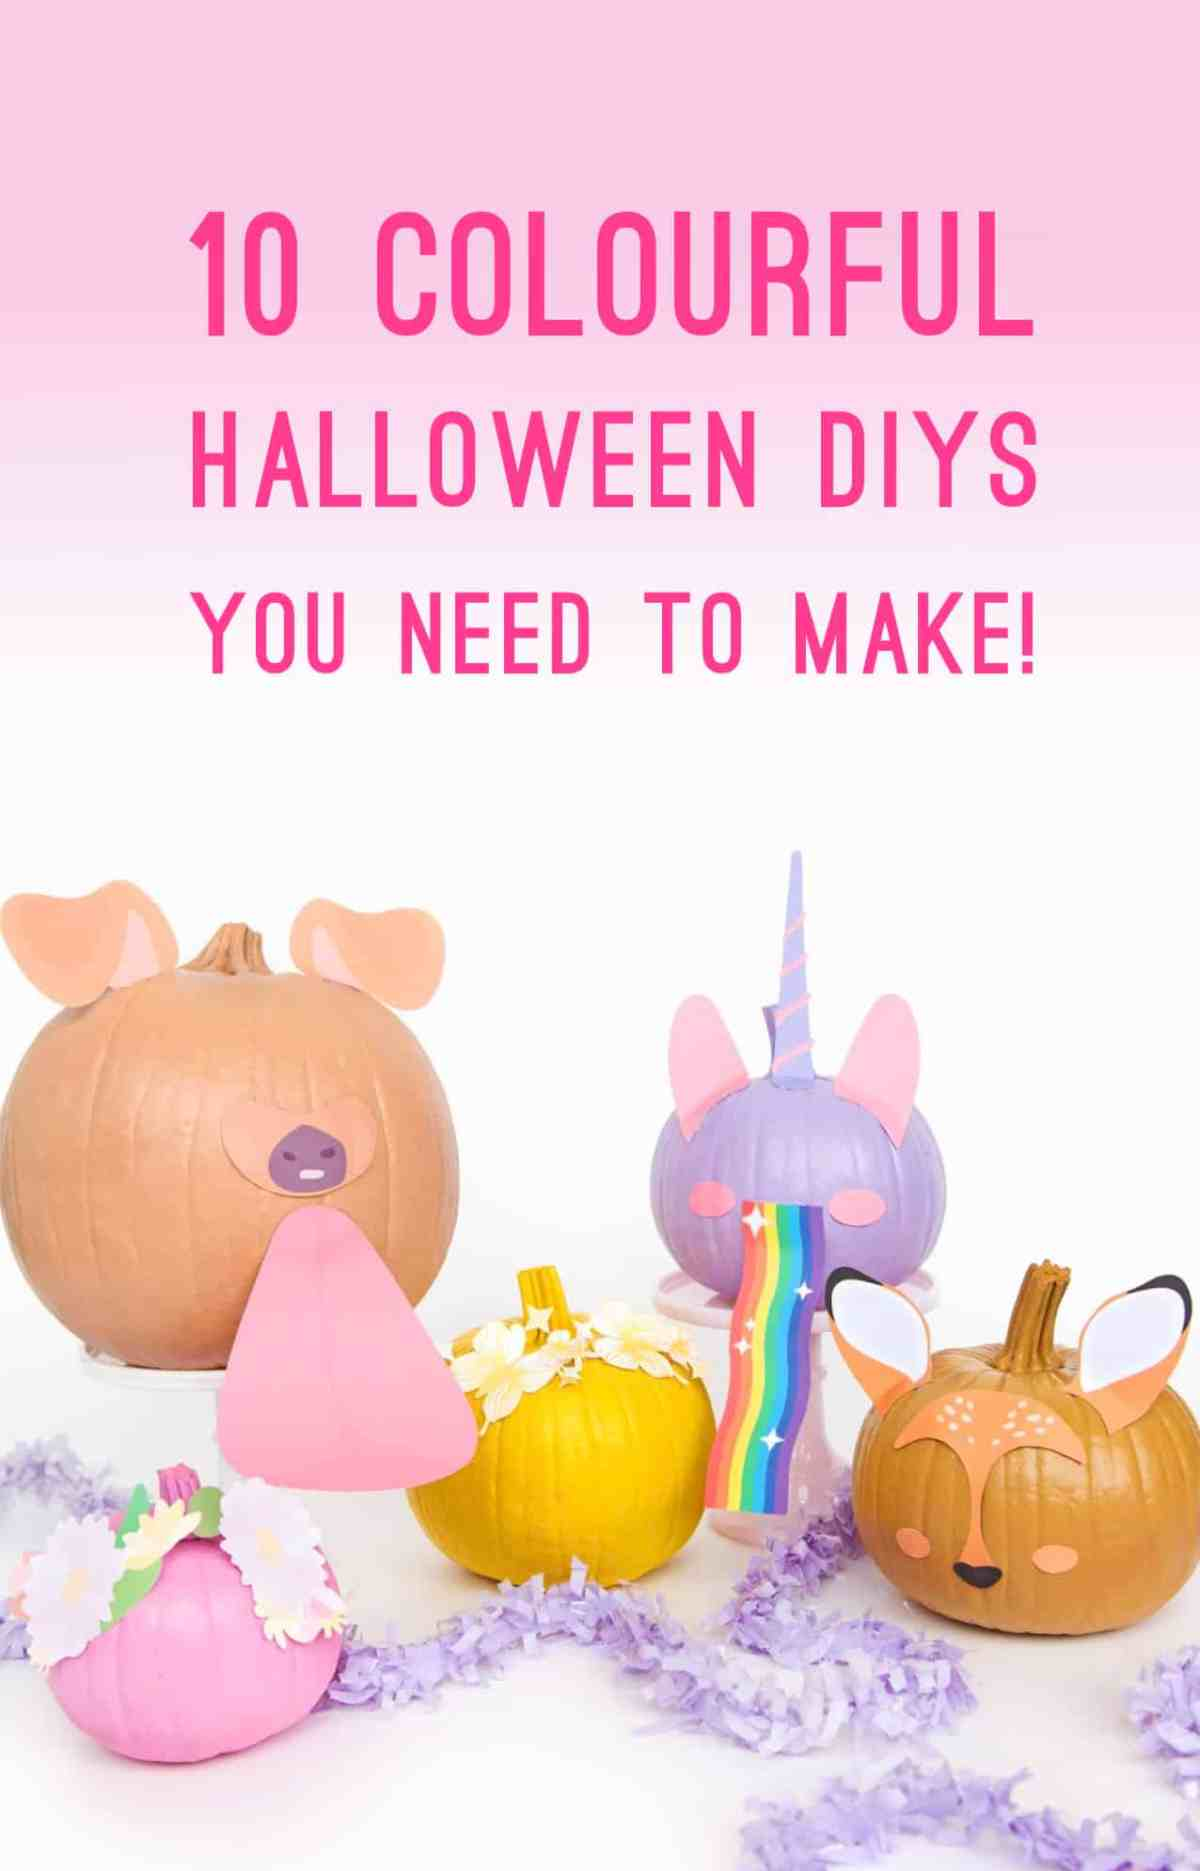 colourful-halloween-decorations-ideas-bright-fun